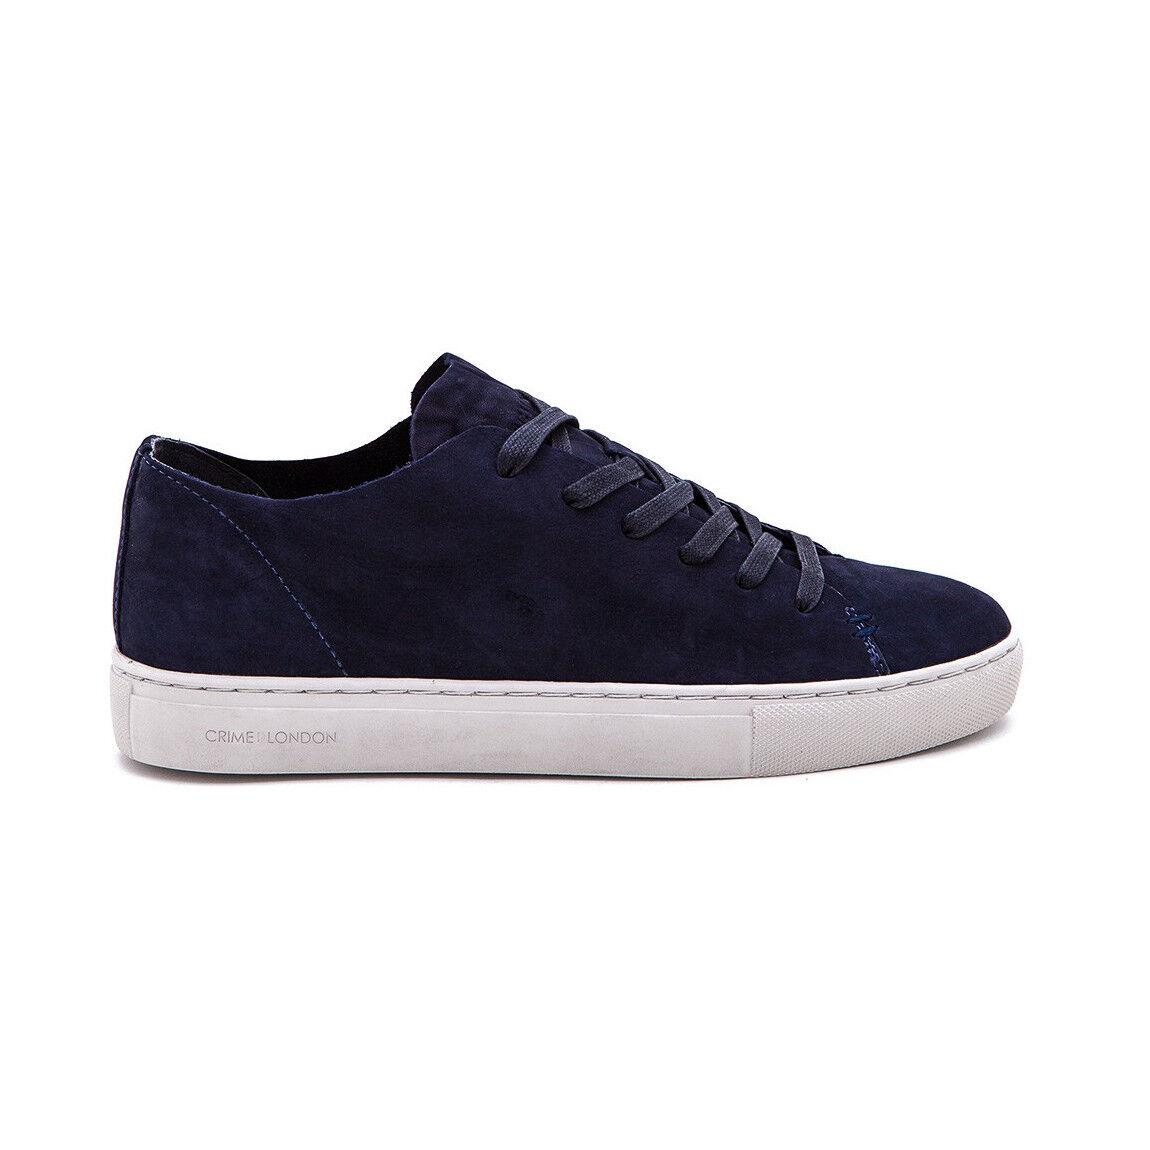 CRIME LONDON Herren Schuhe mod raw LO 11278KS1.40 blau mit